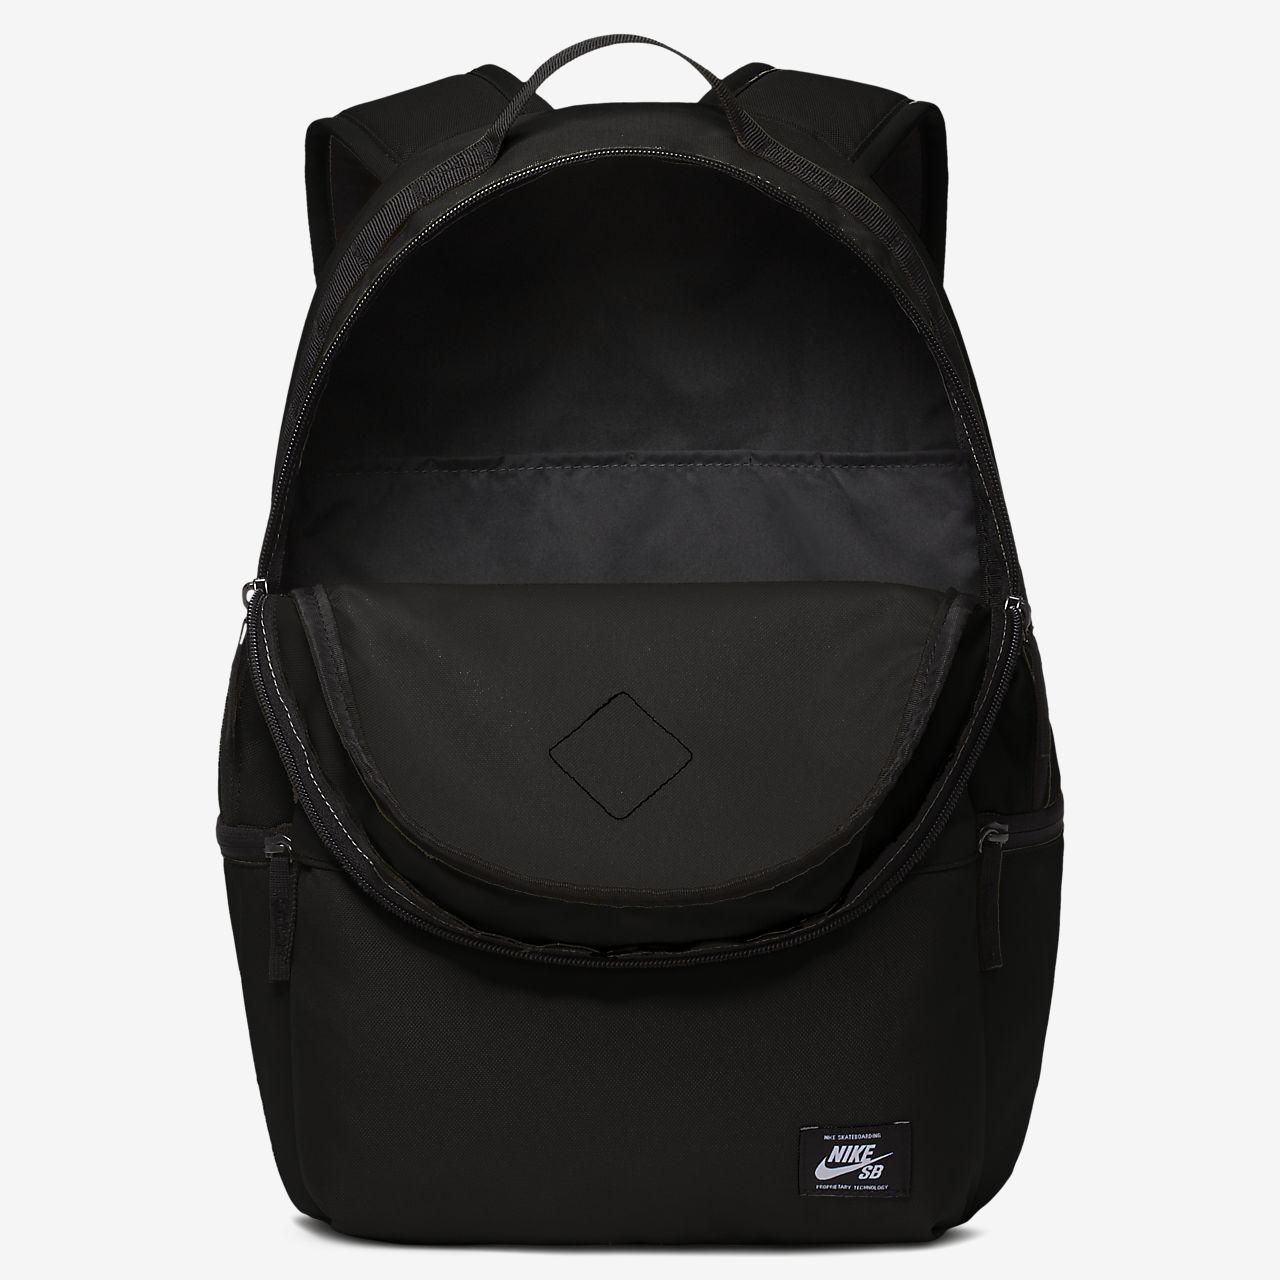 Nike De Sac À Dos / Icône En Gris kfVAx4Od